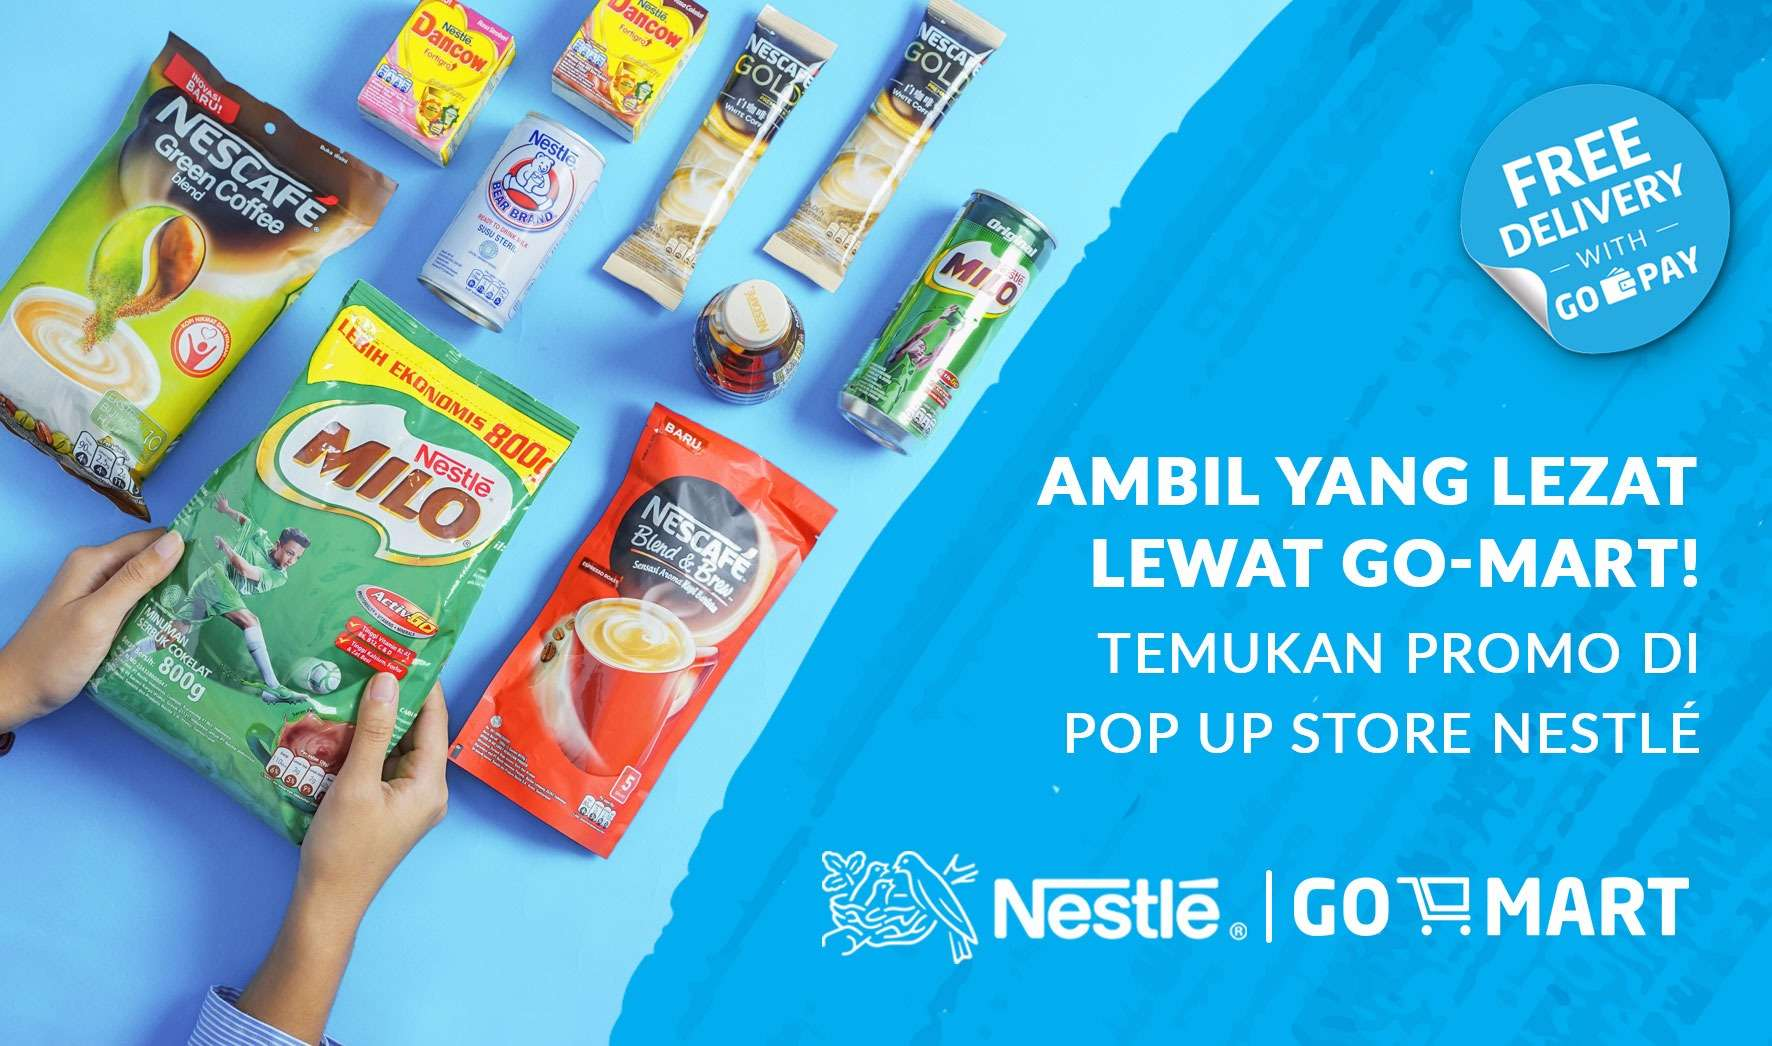 Cegah Suntuk dengan Minuman dari Nestle!